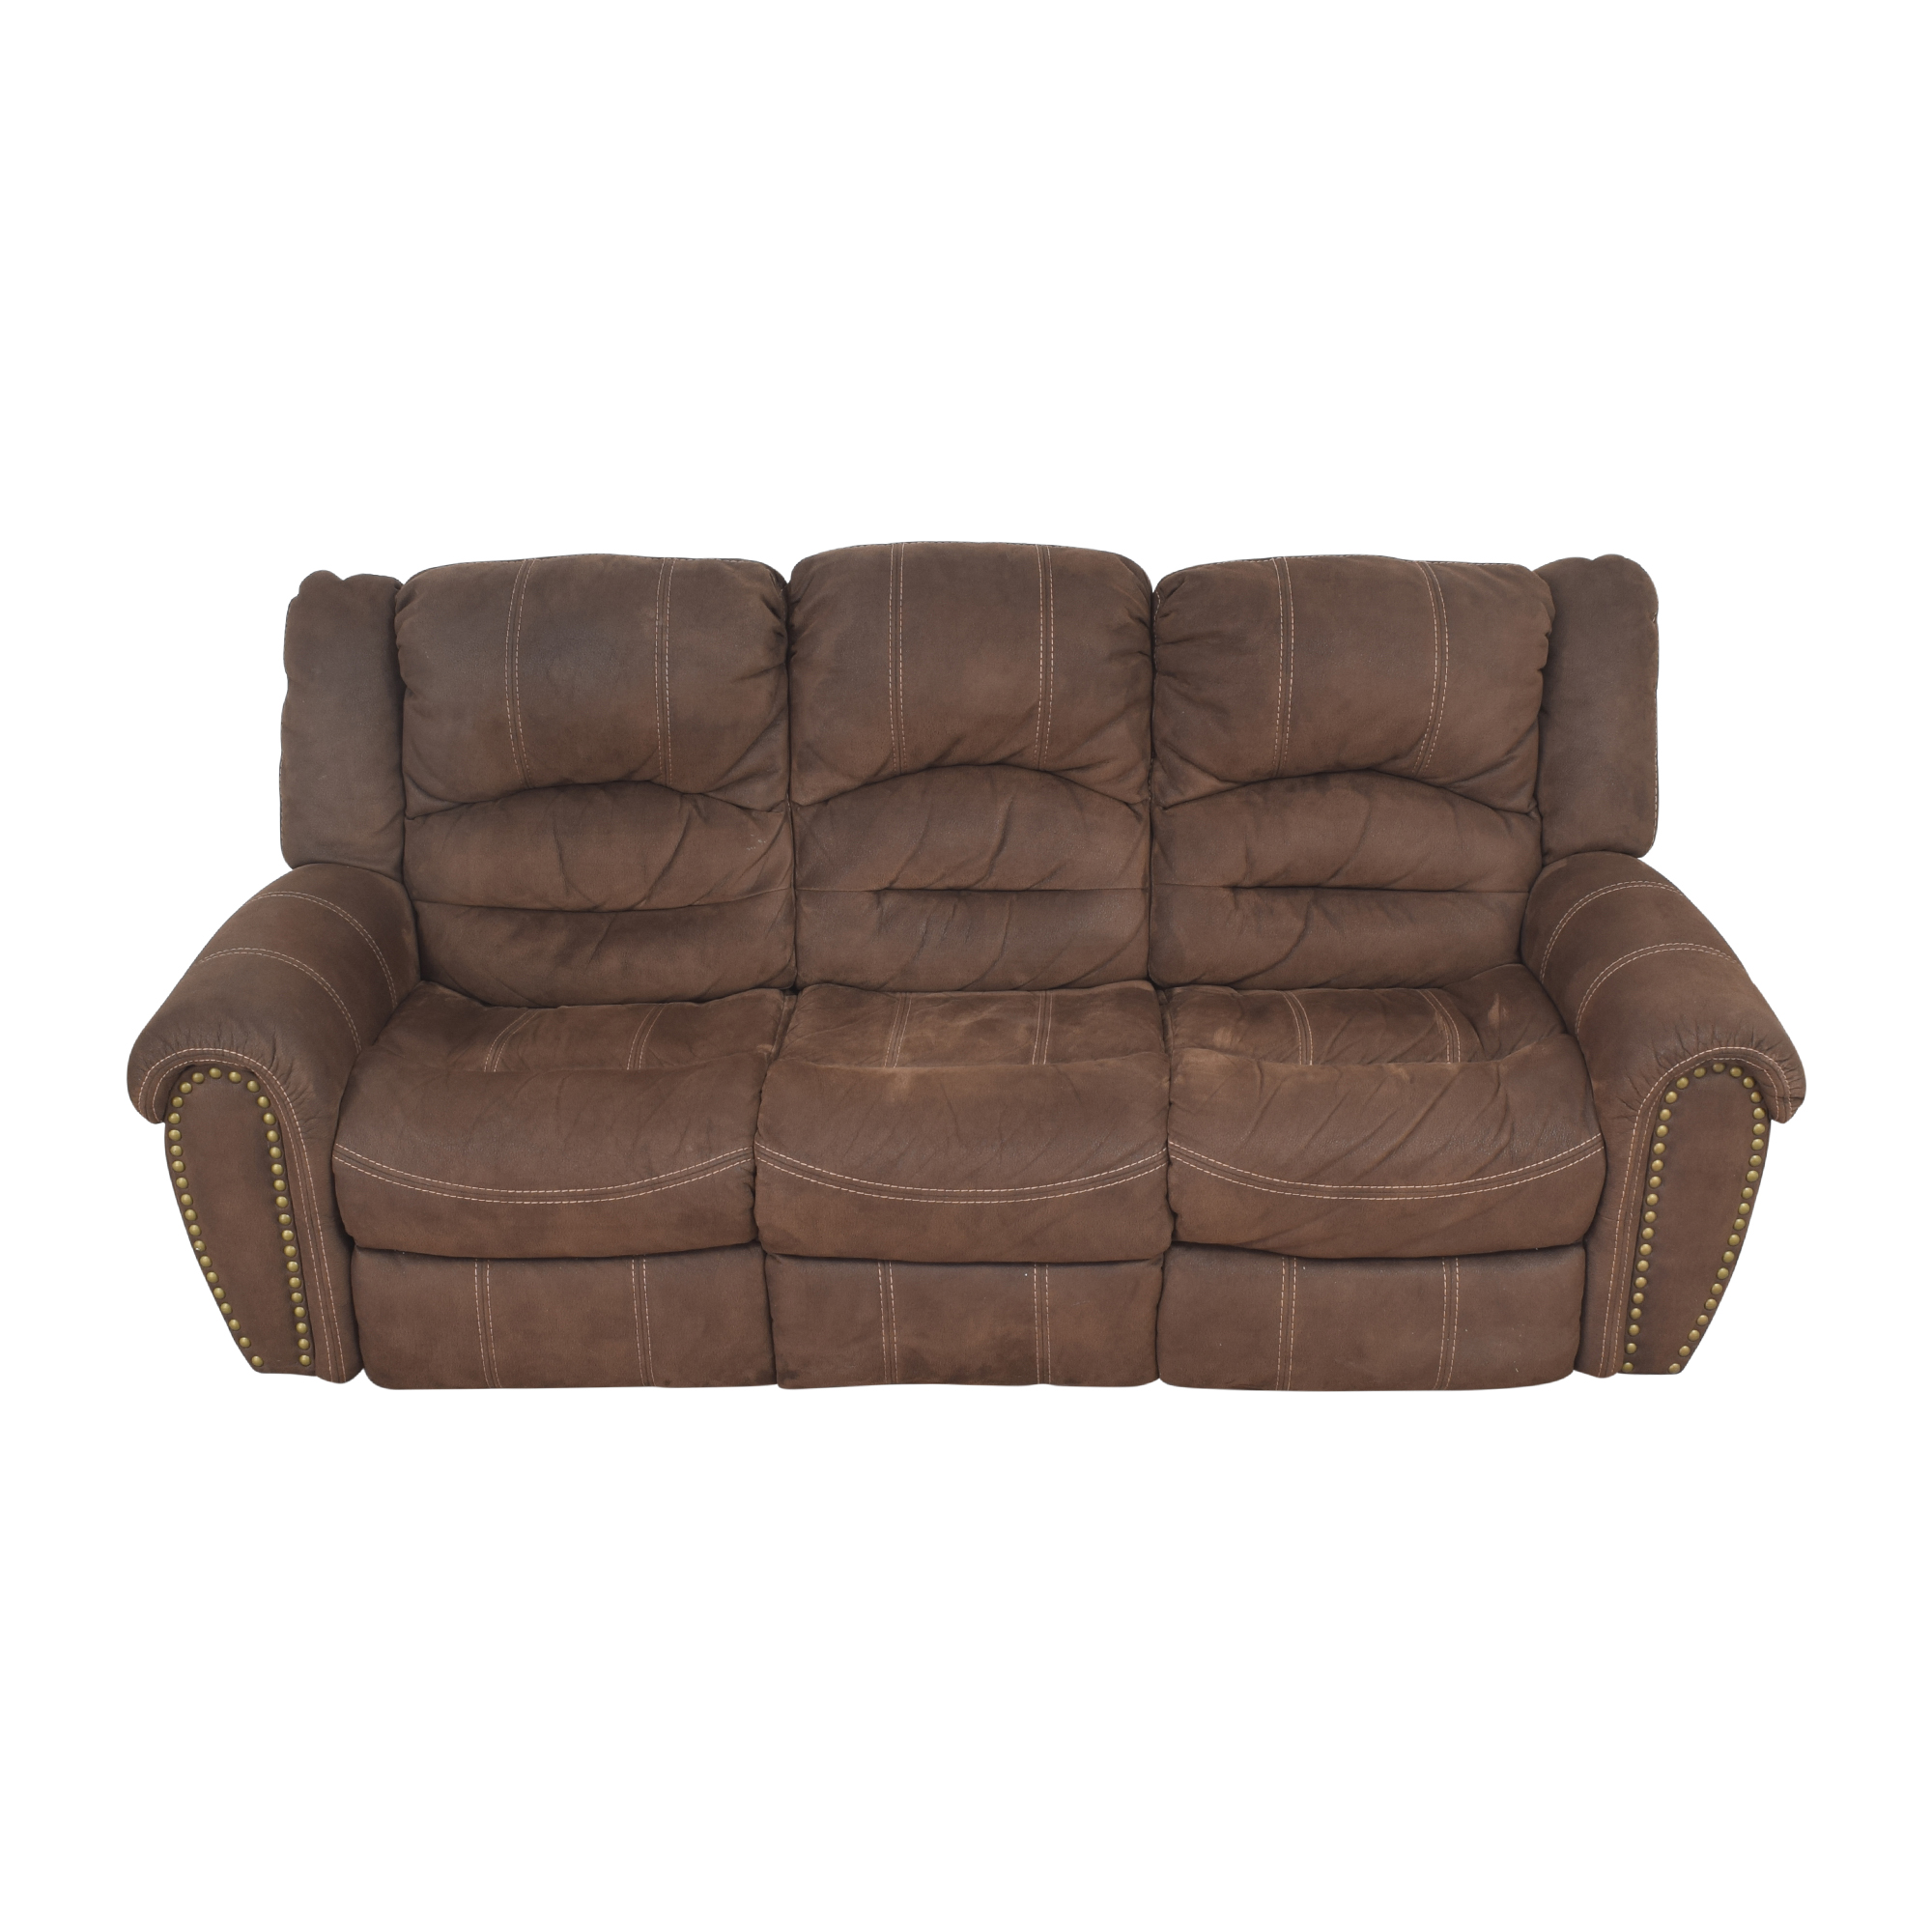 Flexsteel Town Nailhead Reclining Sofa / Classic Sofas